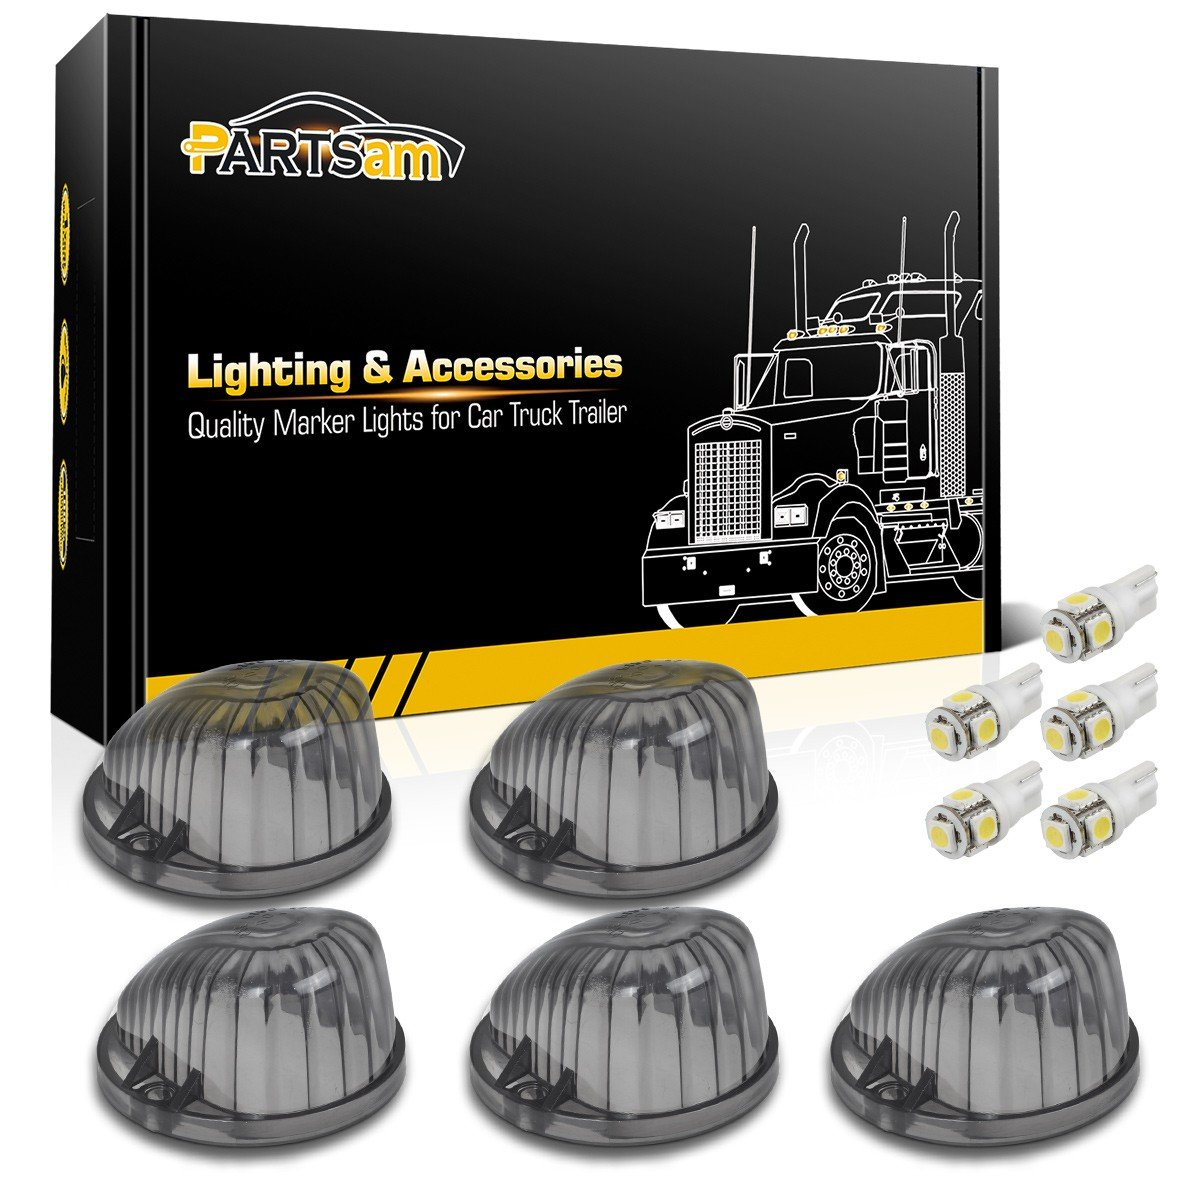 Partsam 5X Cab Marker Round Light Smoke Lens 1313S+ White T10 LED Bulb Compatible with Chevrolet/GMC C1500 C2500 C3500 C4500/Suburban Blazer 1973-1987 Full Size Pickup Trucks